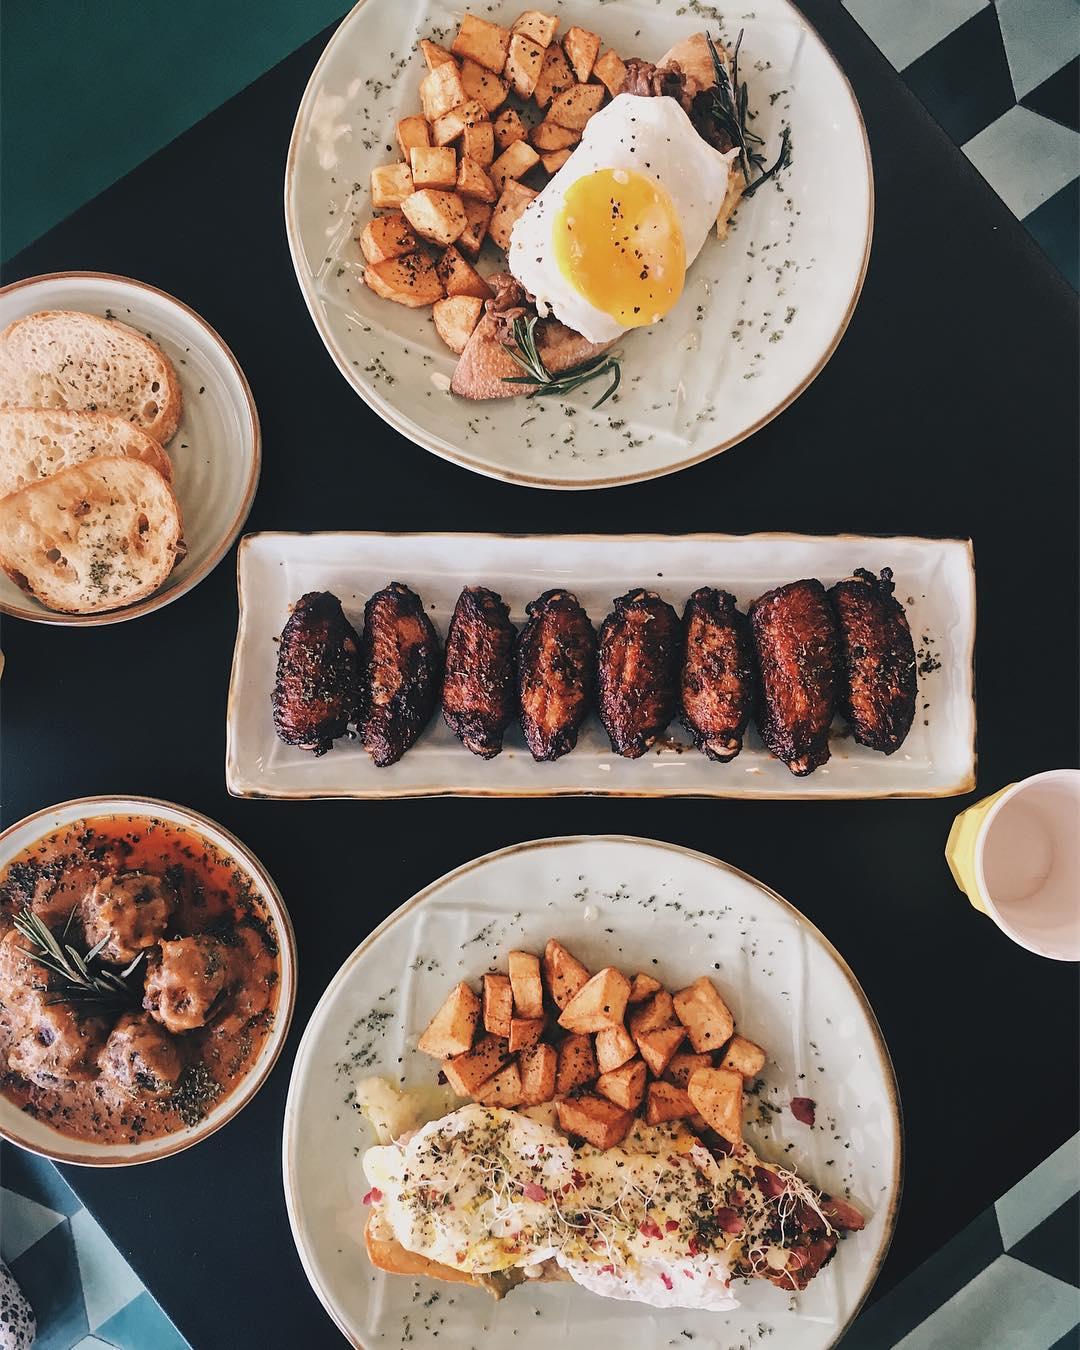 Spanish Tapas Restaurants - The Great Mischief